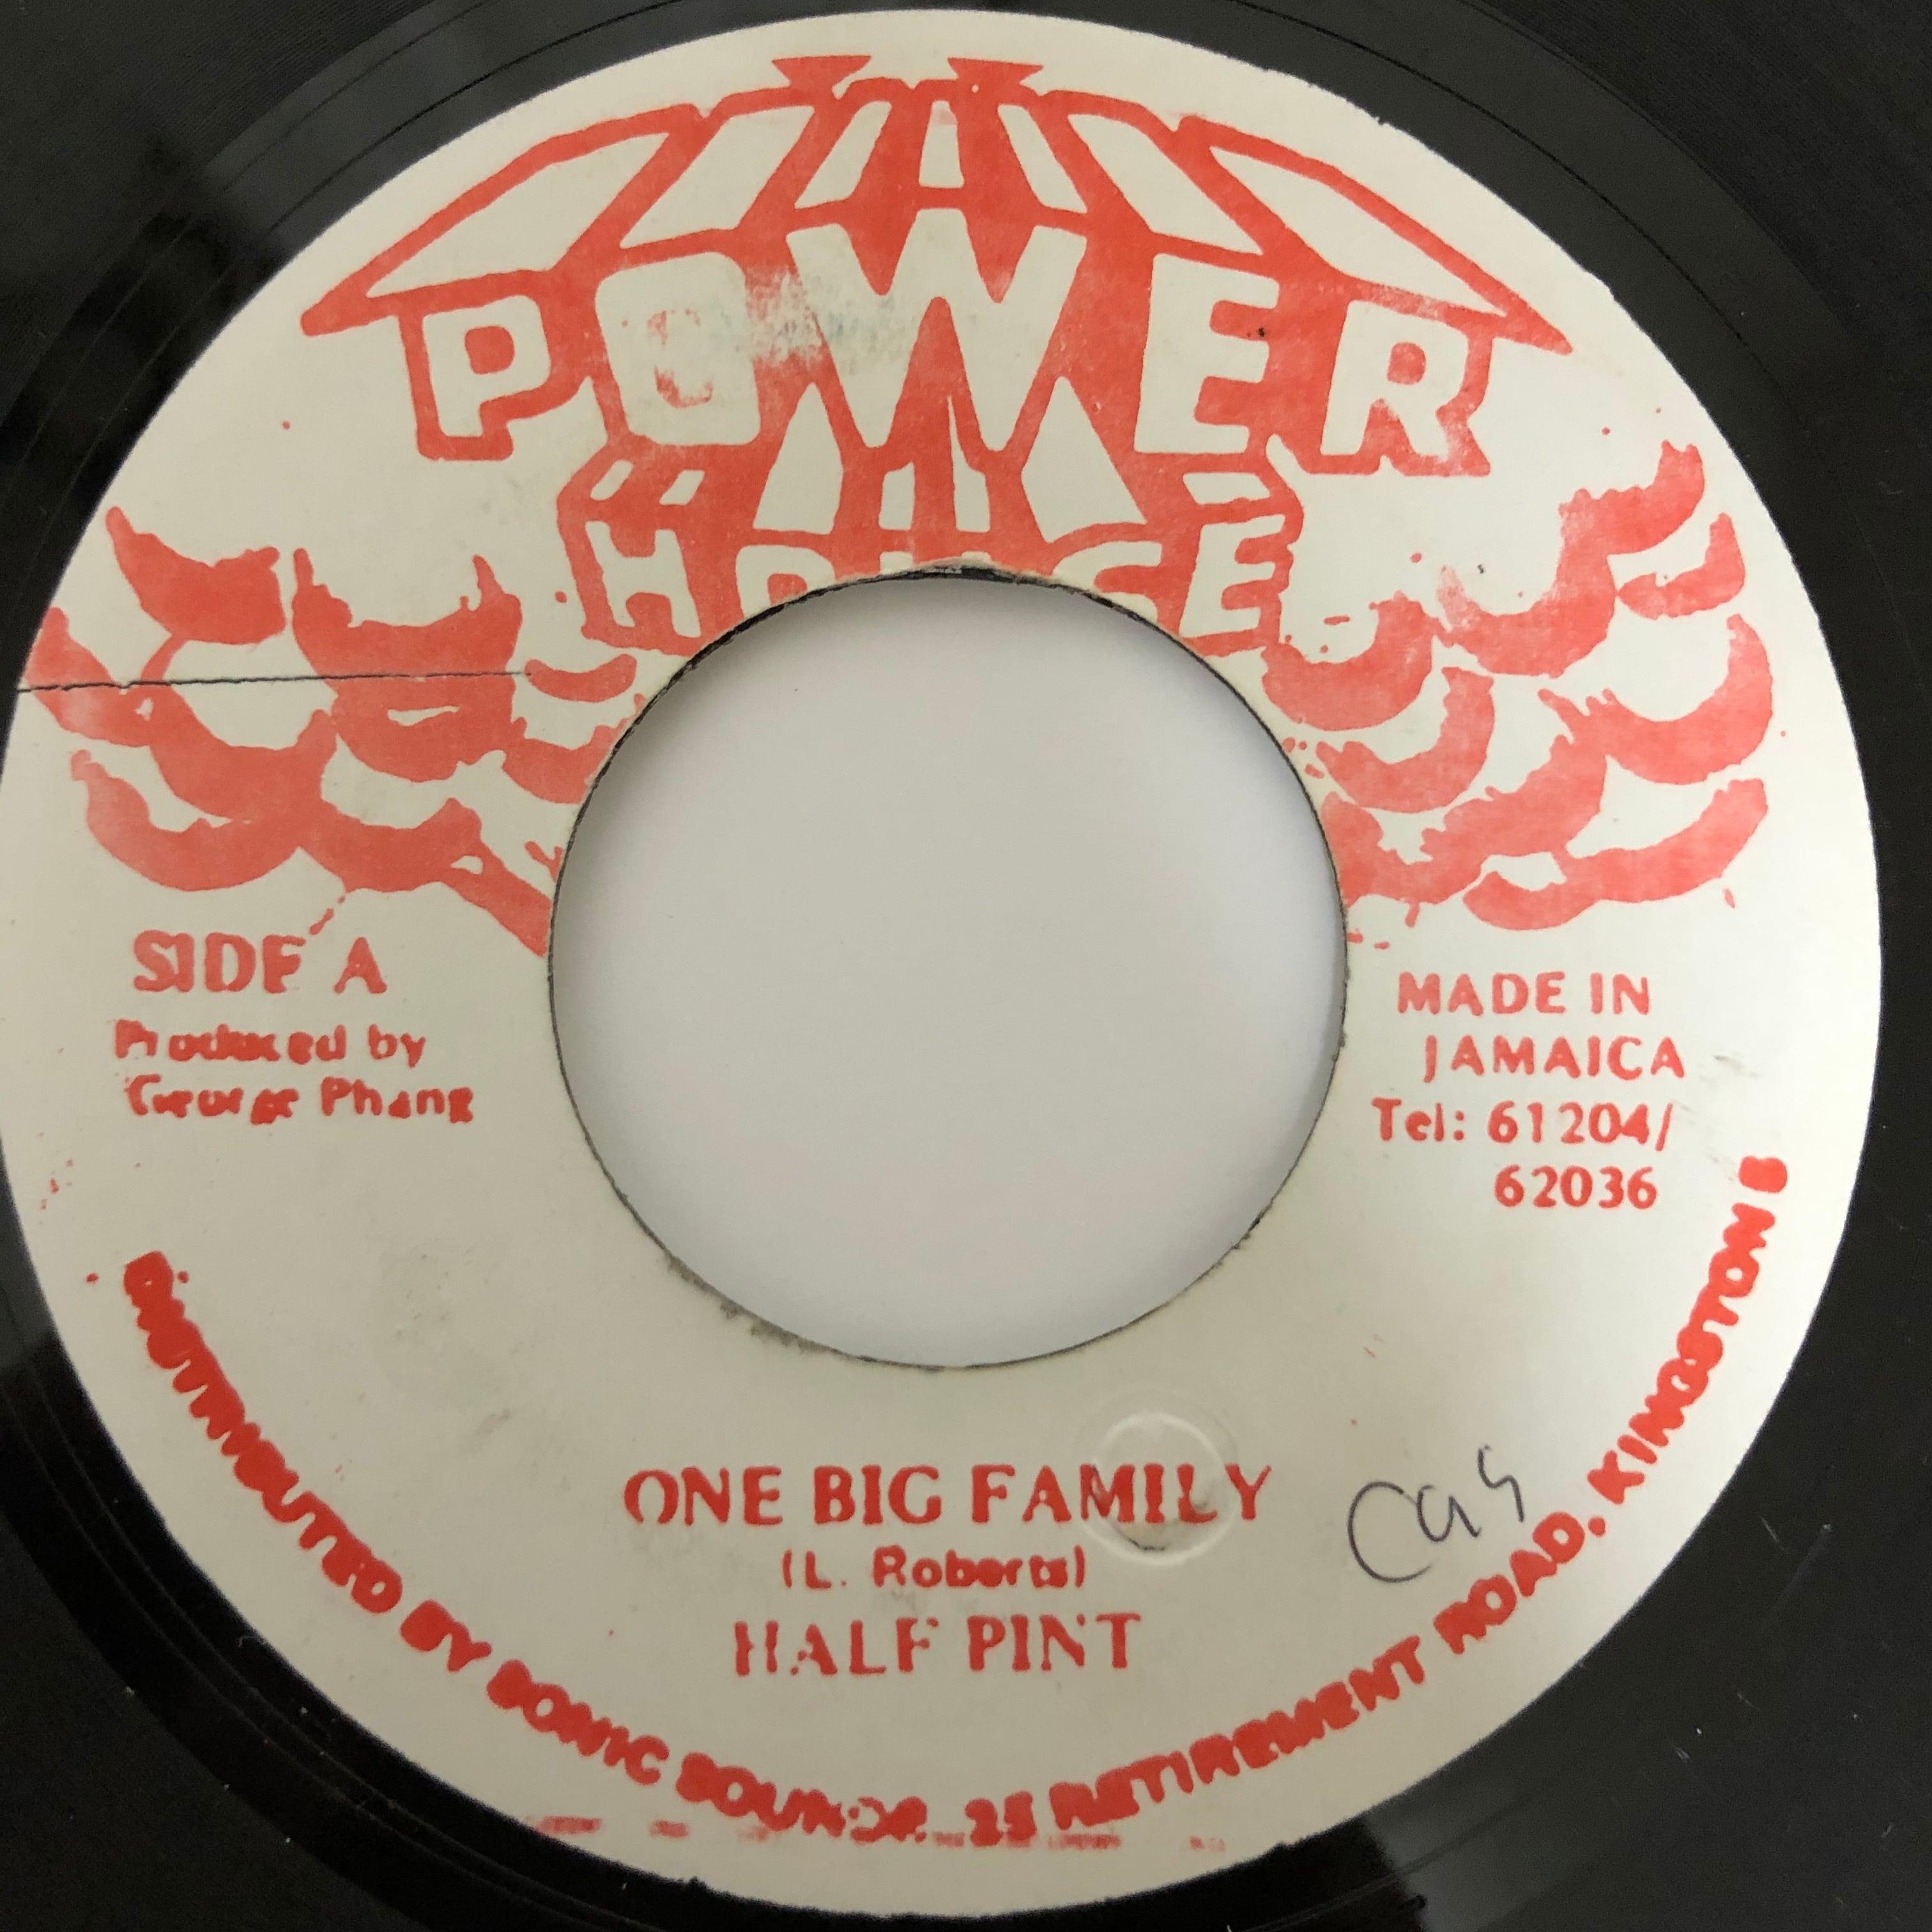 Half Pint - One Big Family【7-20405】